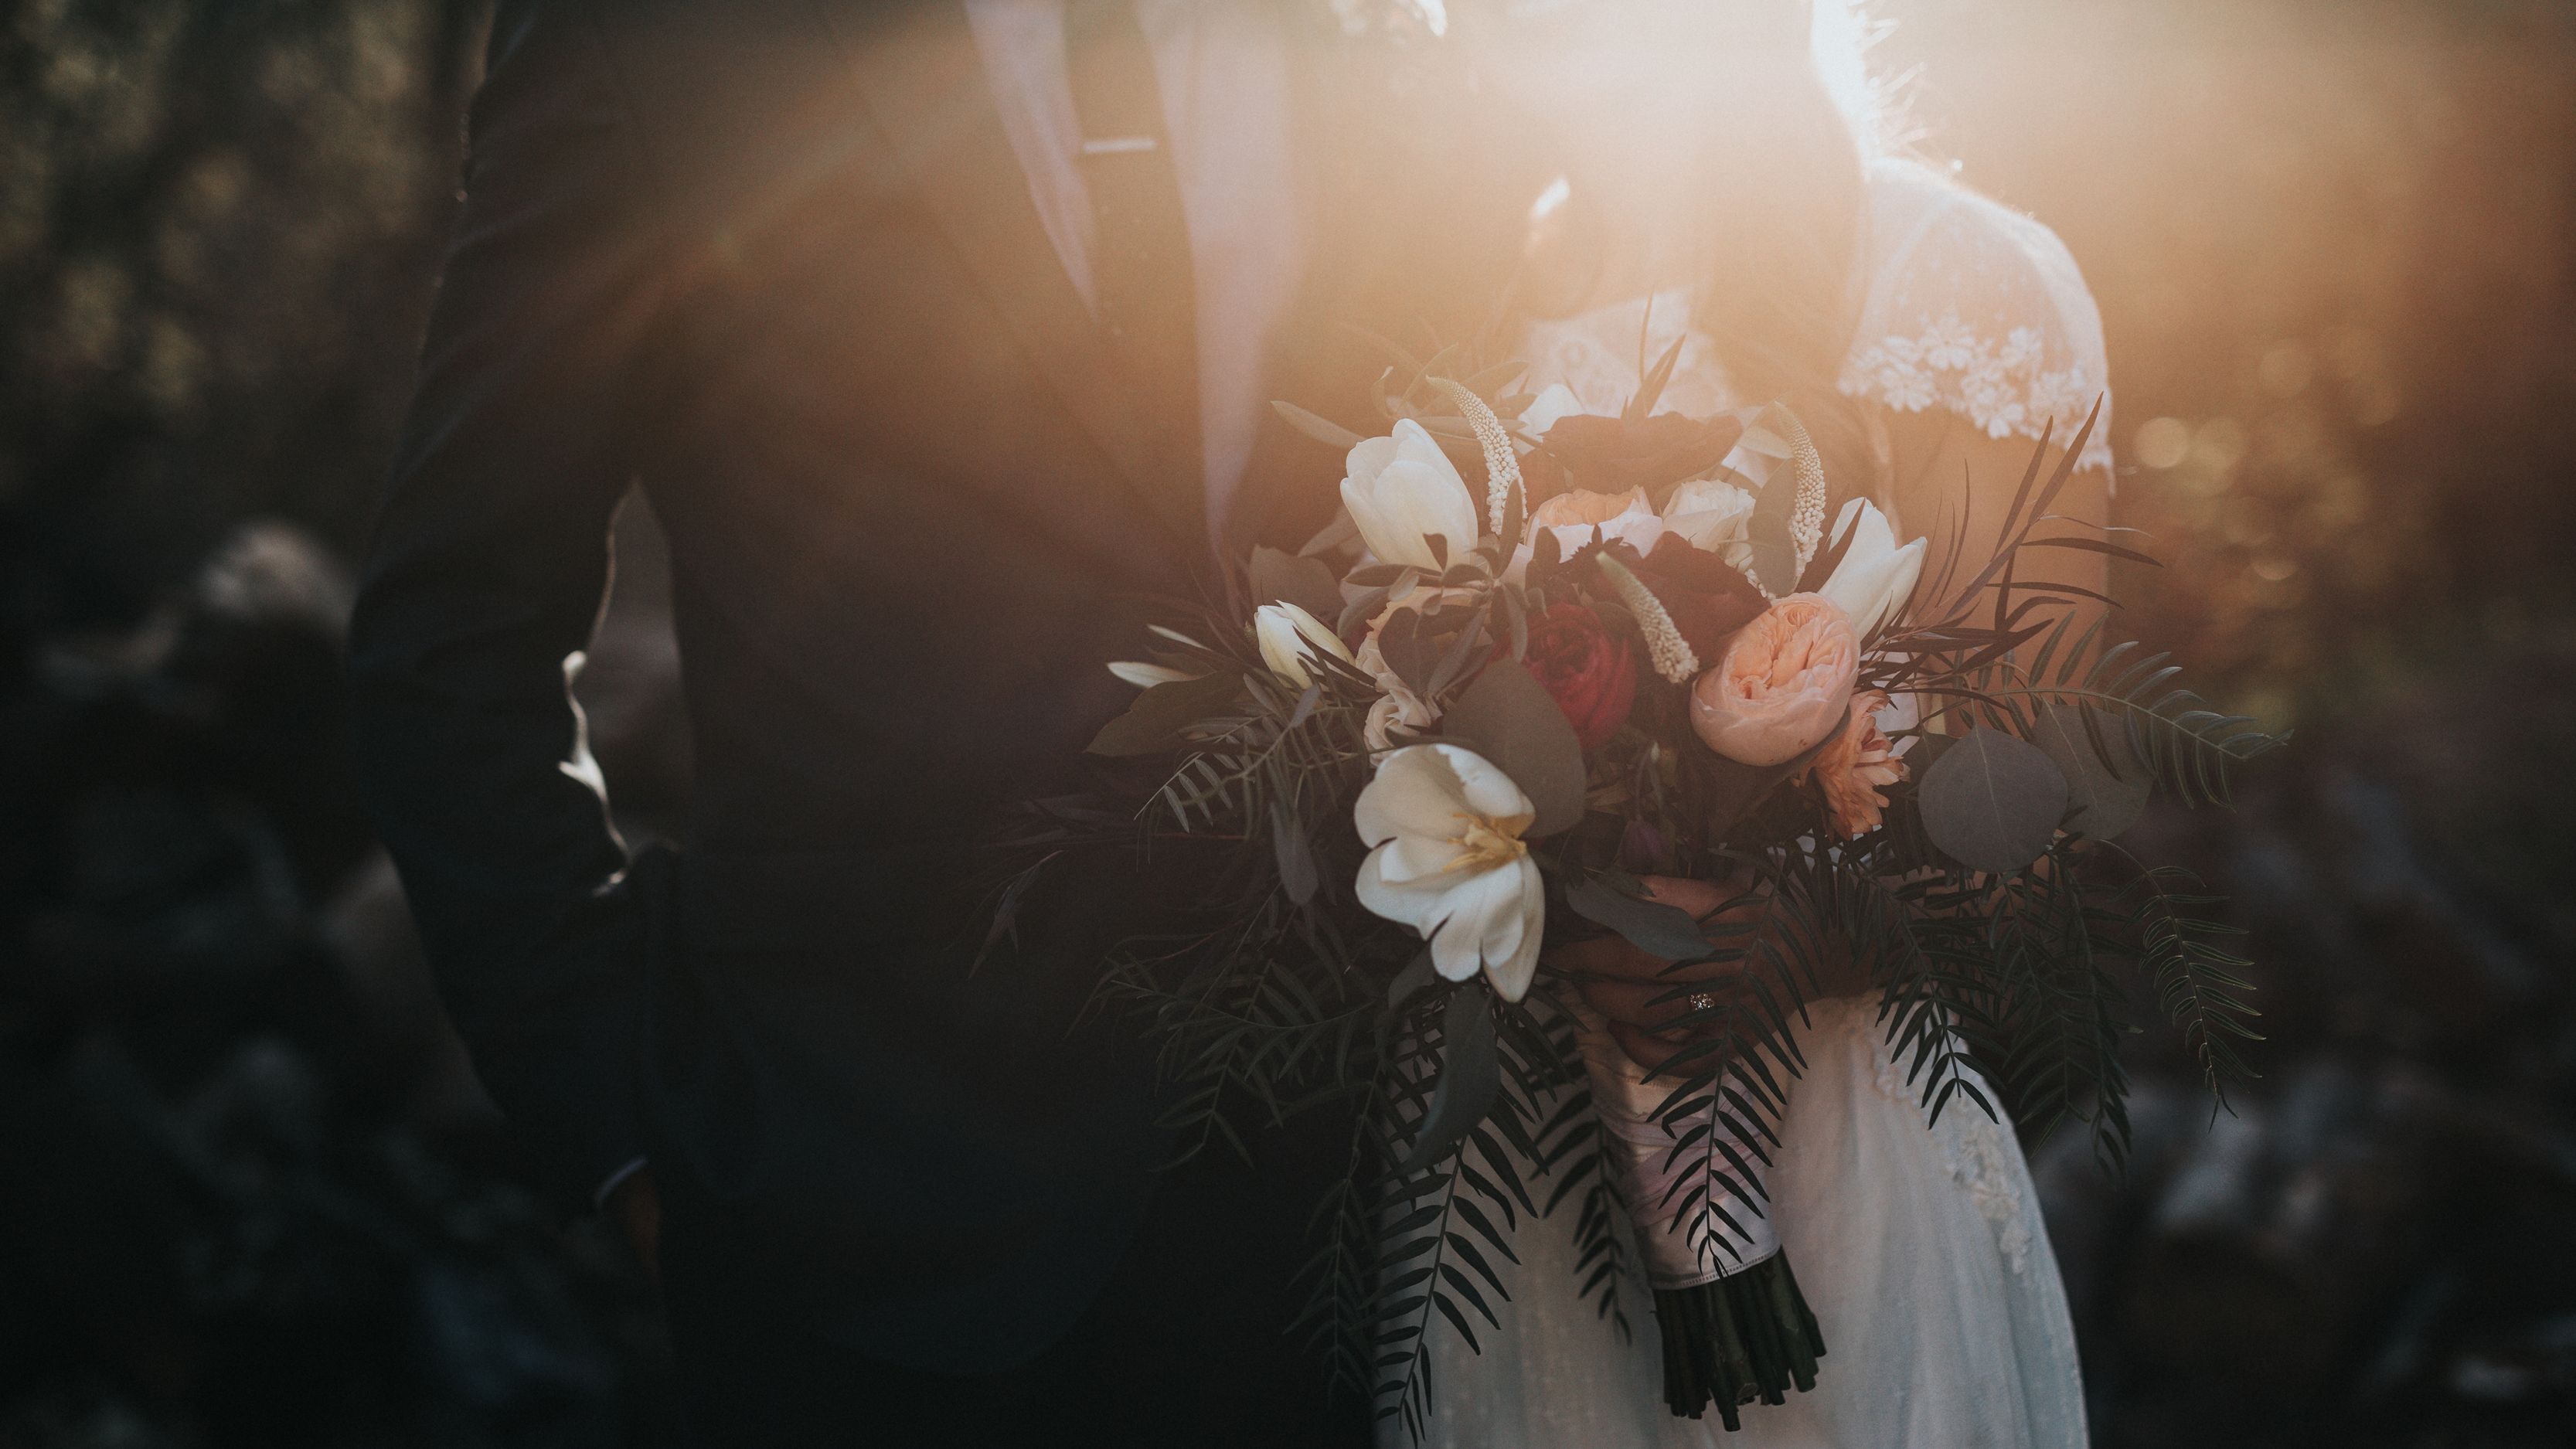 Trayendo Gloria a Dios en el Matrimonio (Bringing Glory to God in Marriage)